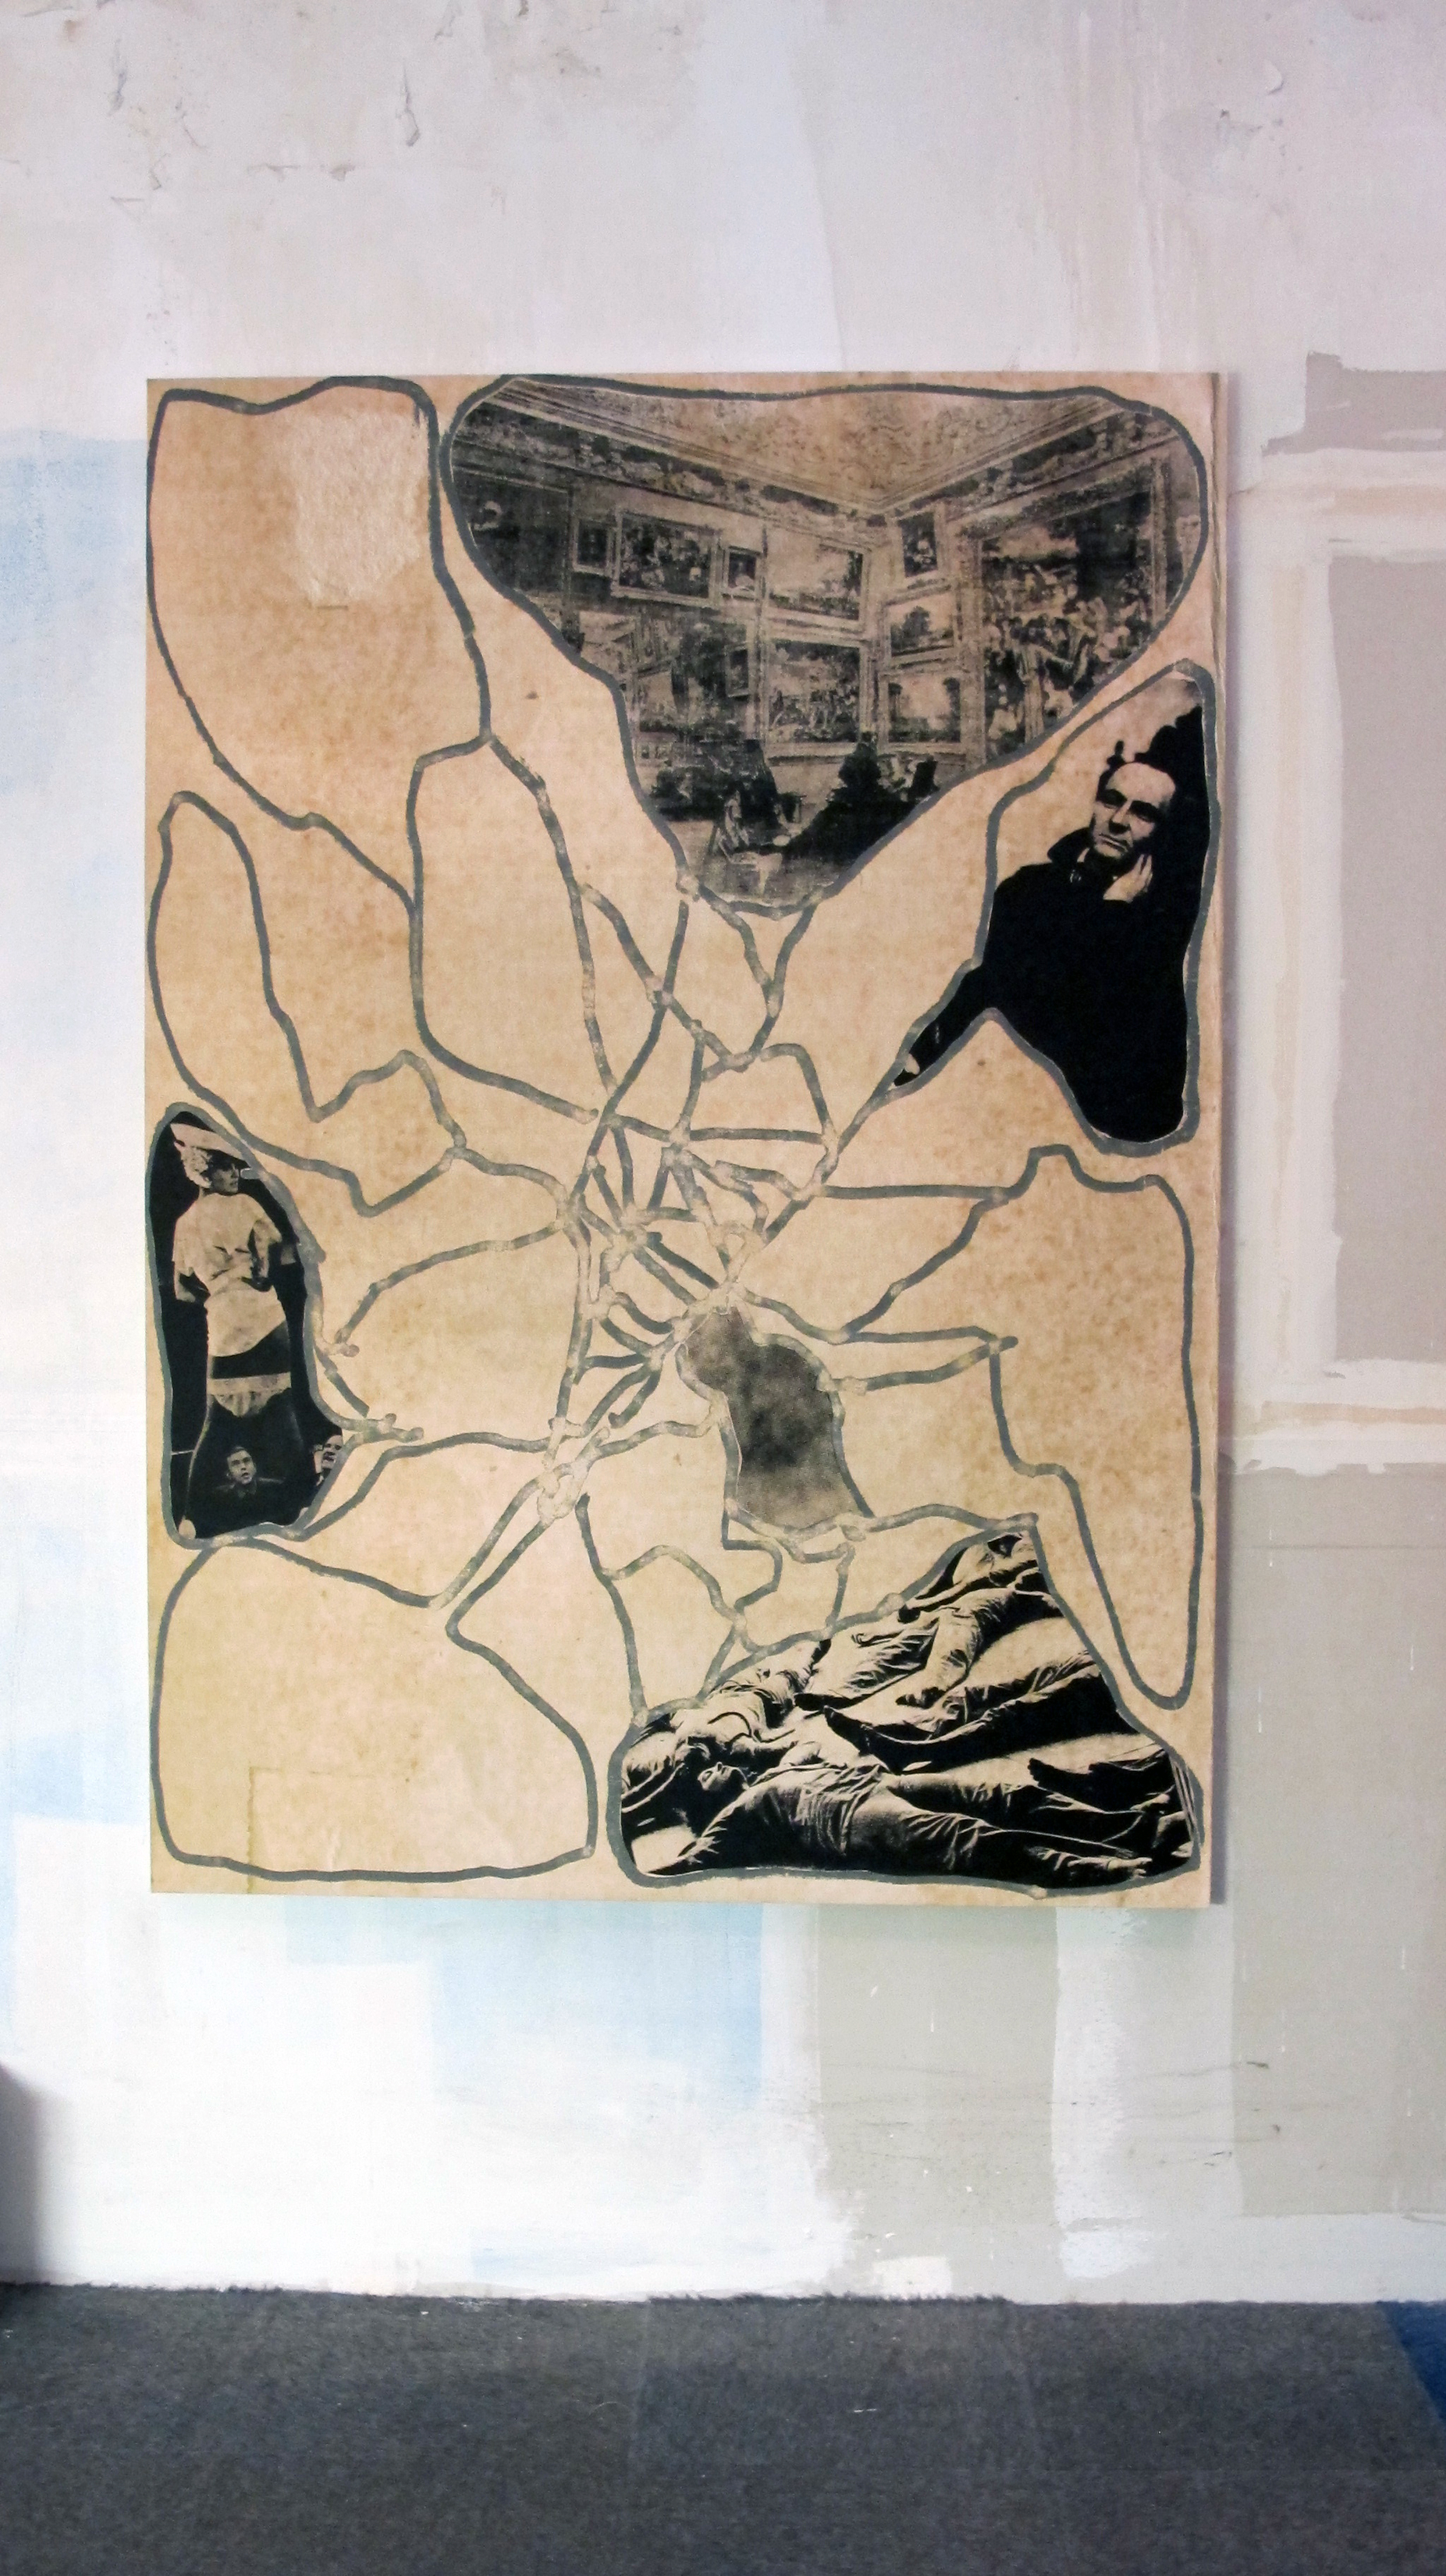 Freeman-Lowe, PANOPTICUM, Robert Miller Gallery, Installation View 16.jpg